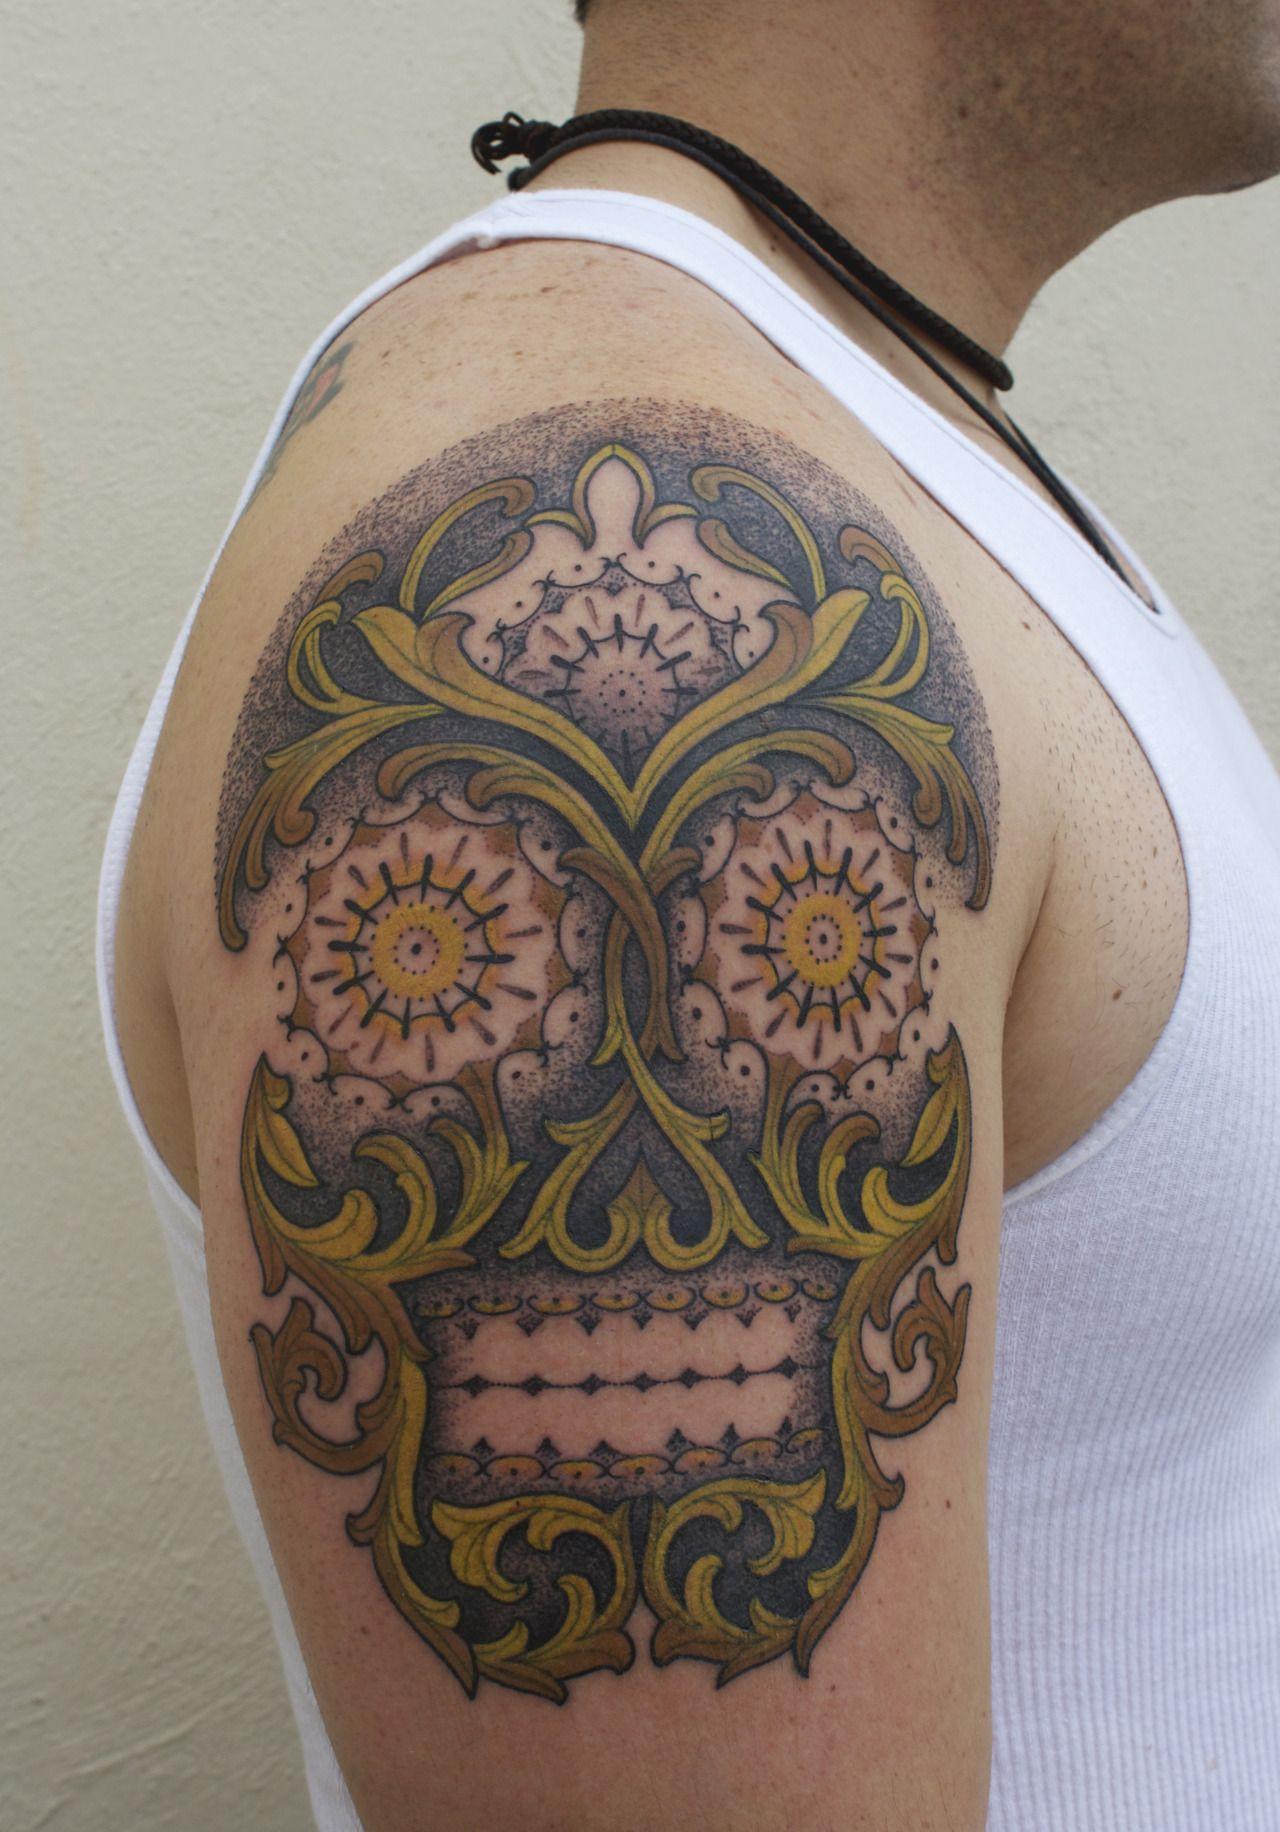 Full Circle Tattoo - visualamor: Gemma Parientetattoos like a...